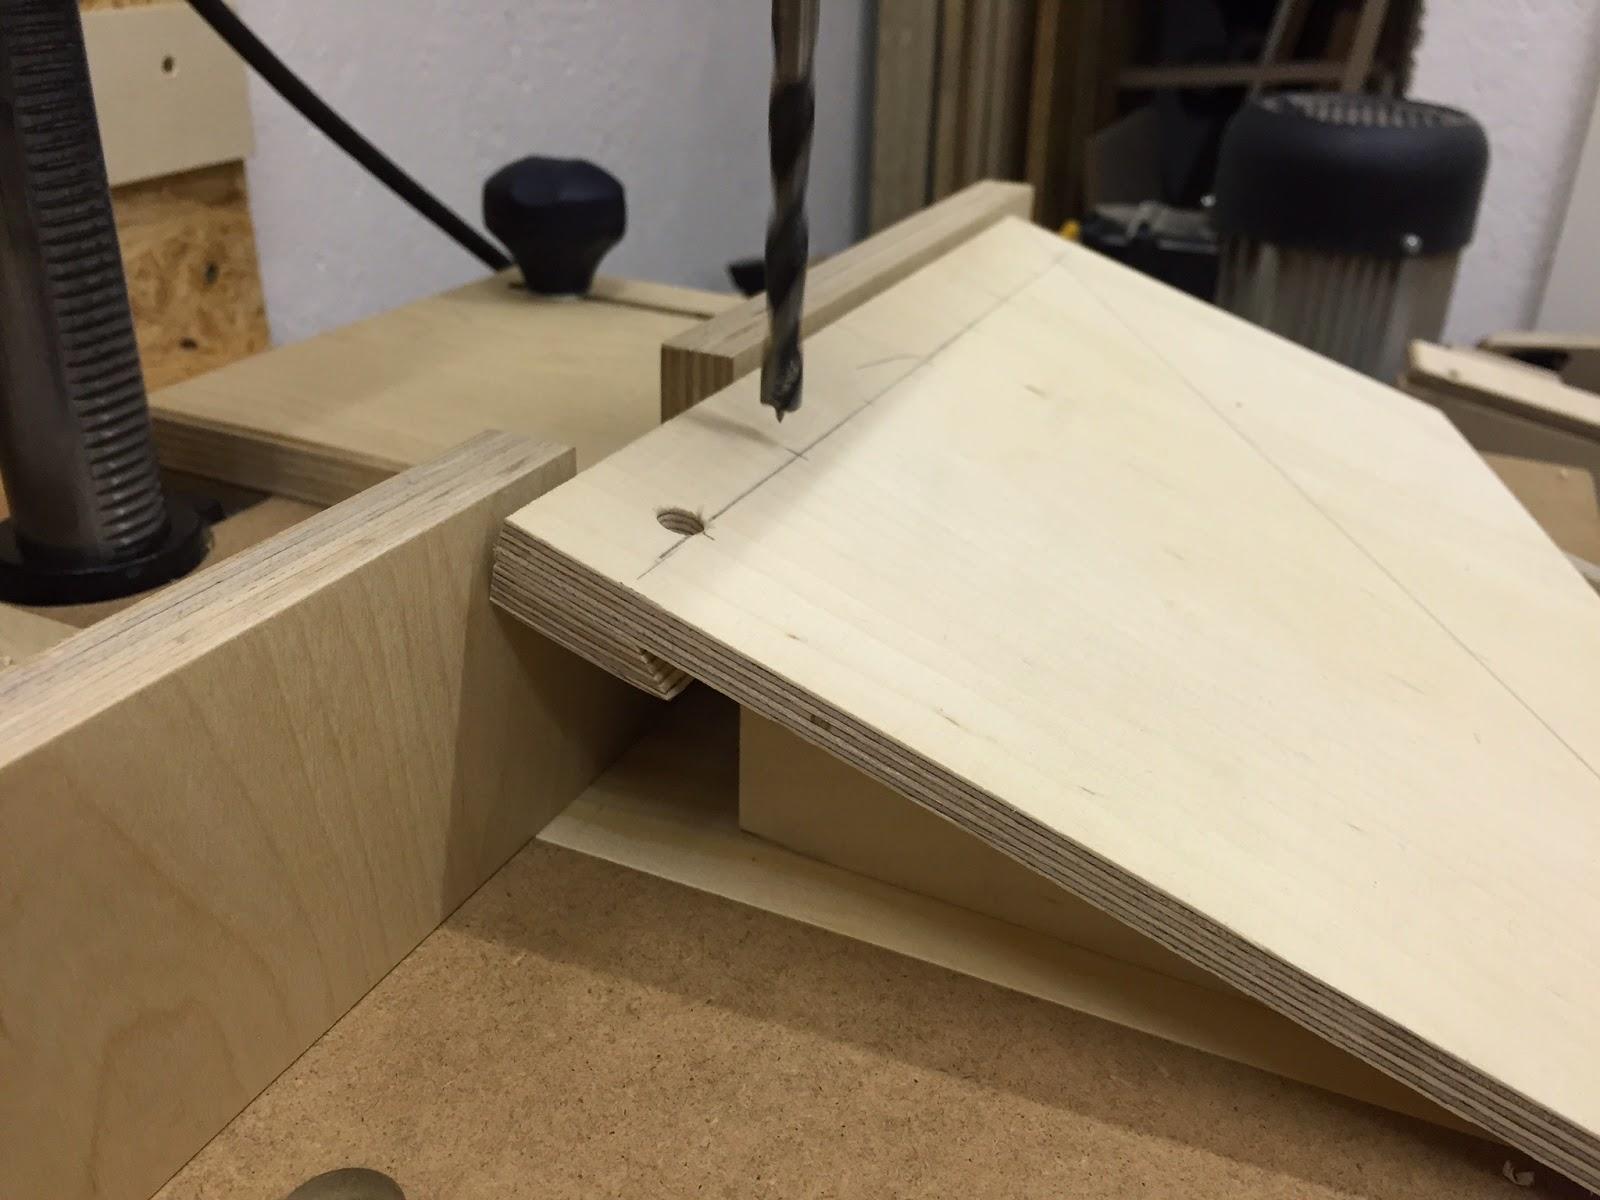 french cleat aufh ngesystem f r handwerkzeuge. Black Bedroom Furniture Sets. Home Design Ideas